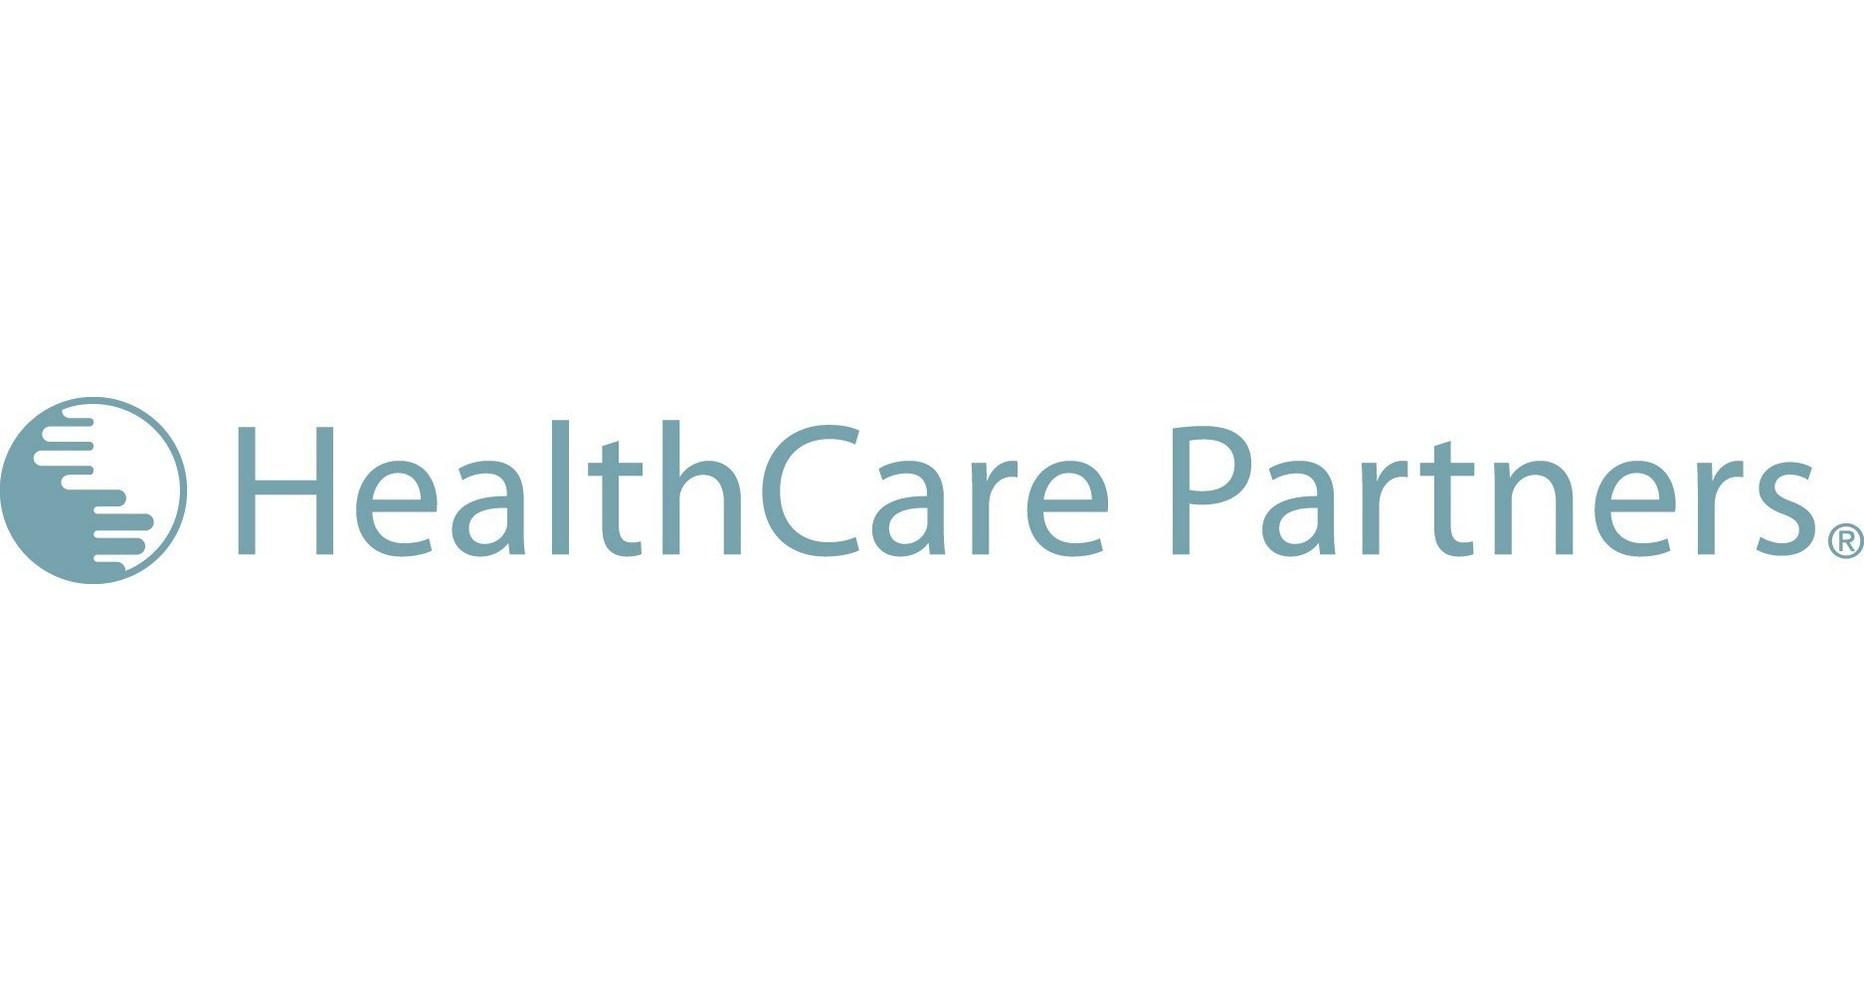 Partners healthcare Logos